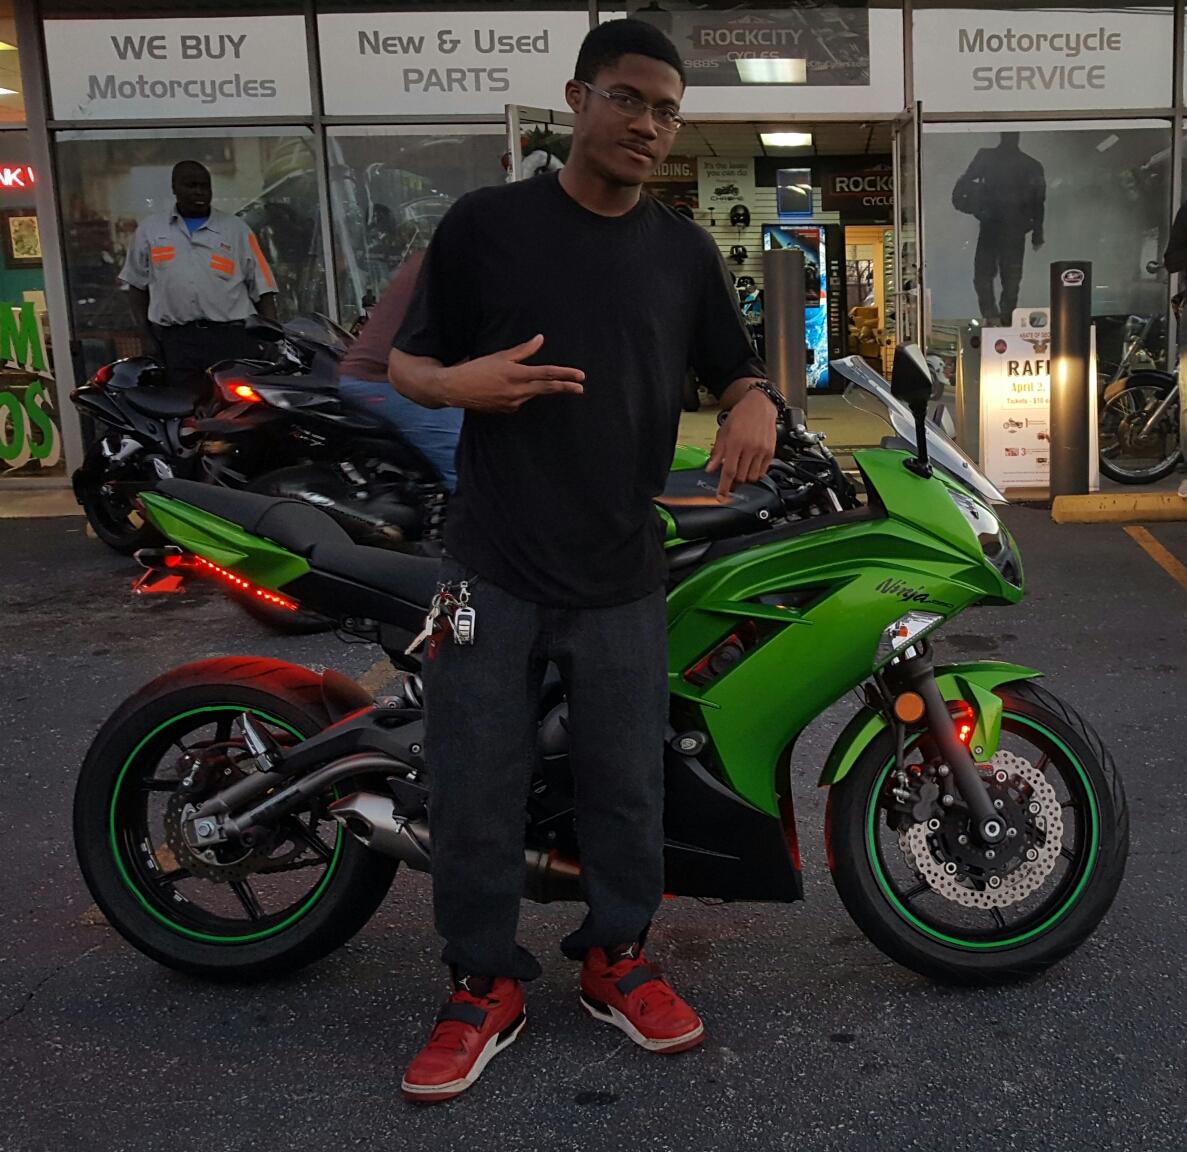 Camryn M. with his 2012 Kawasaki Ninja EX650